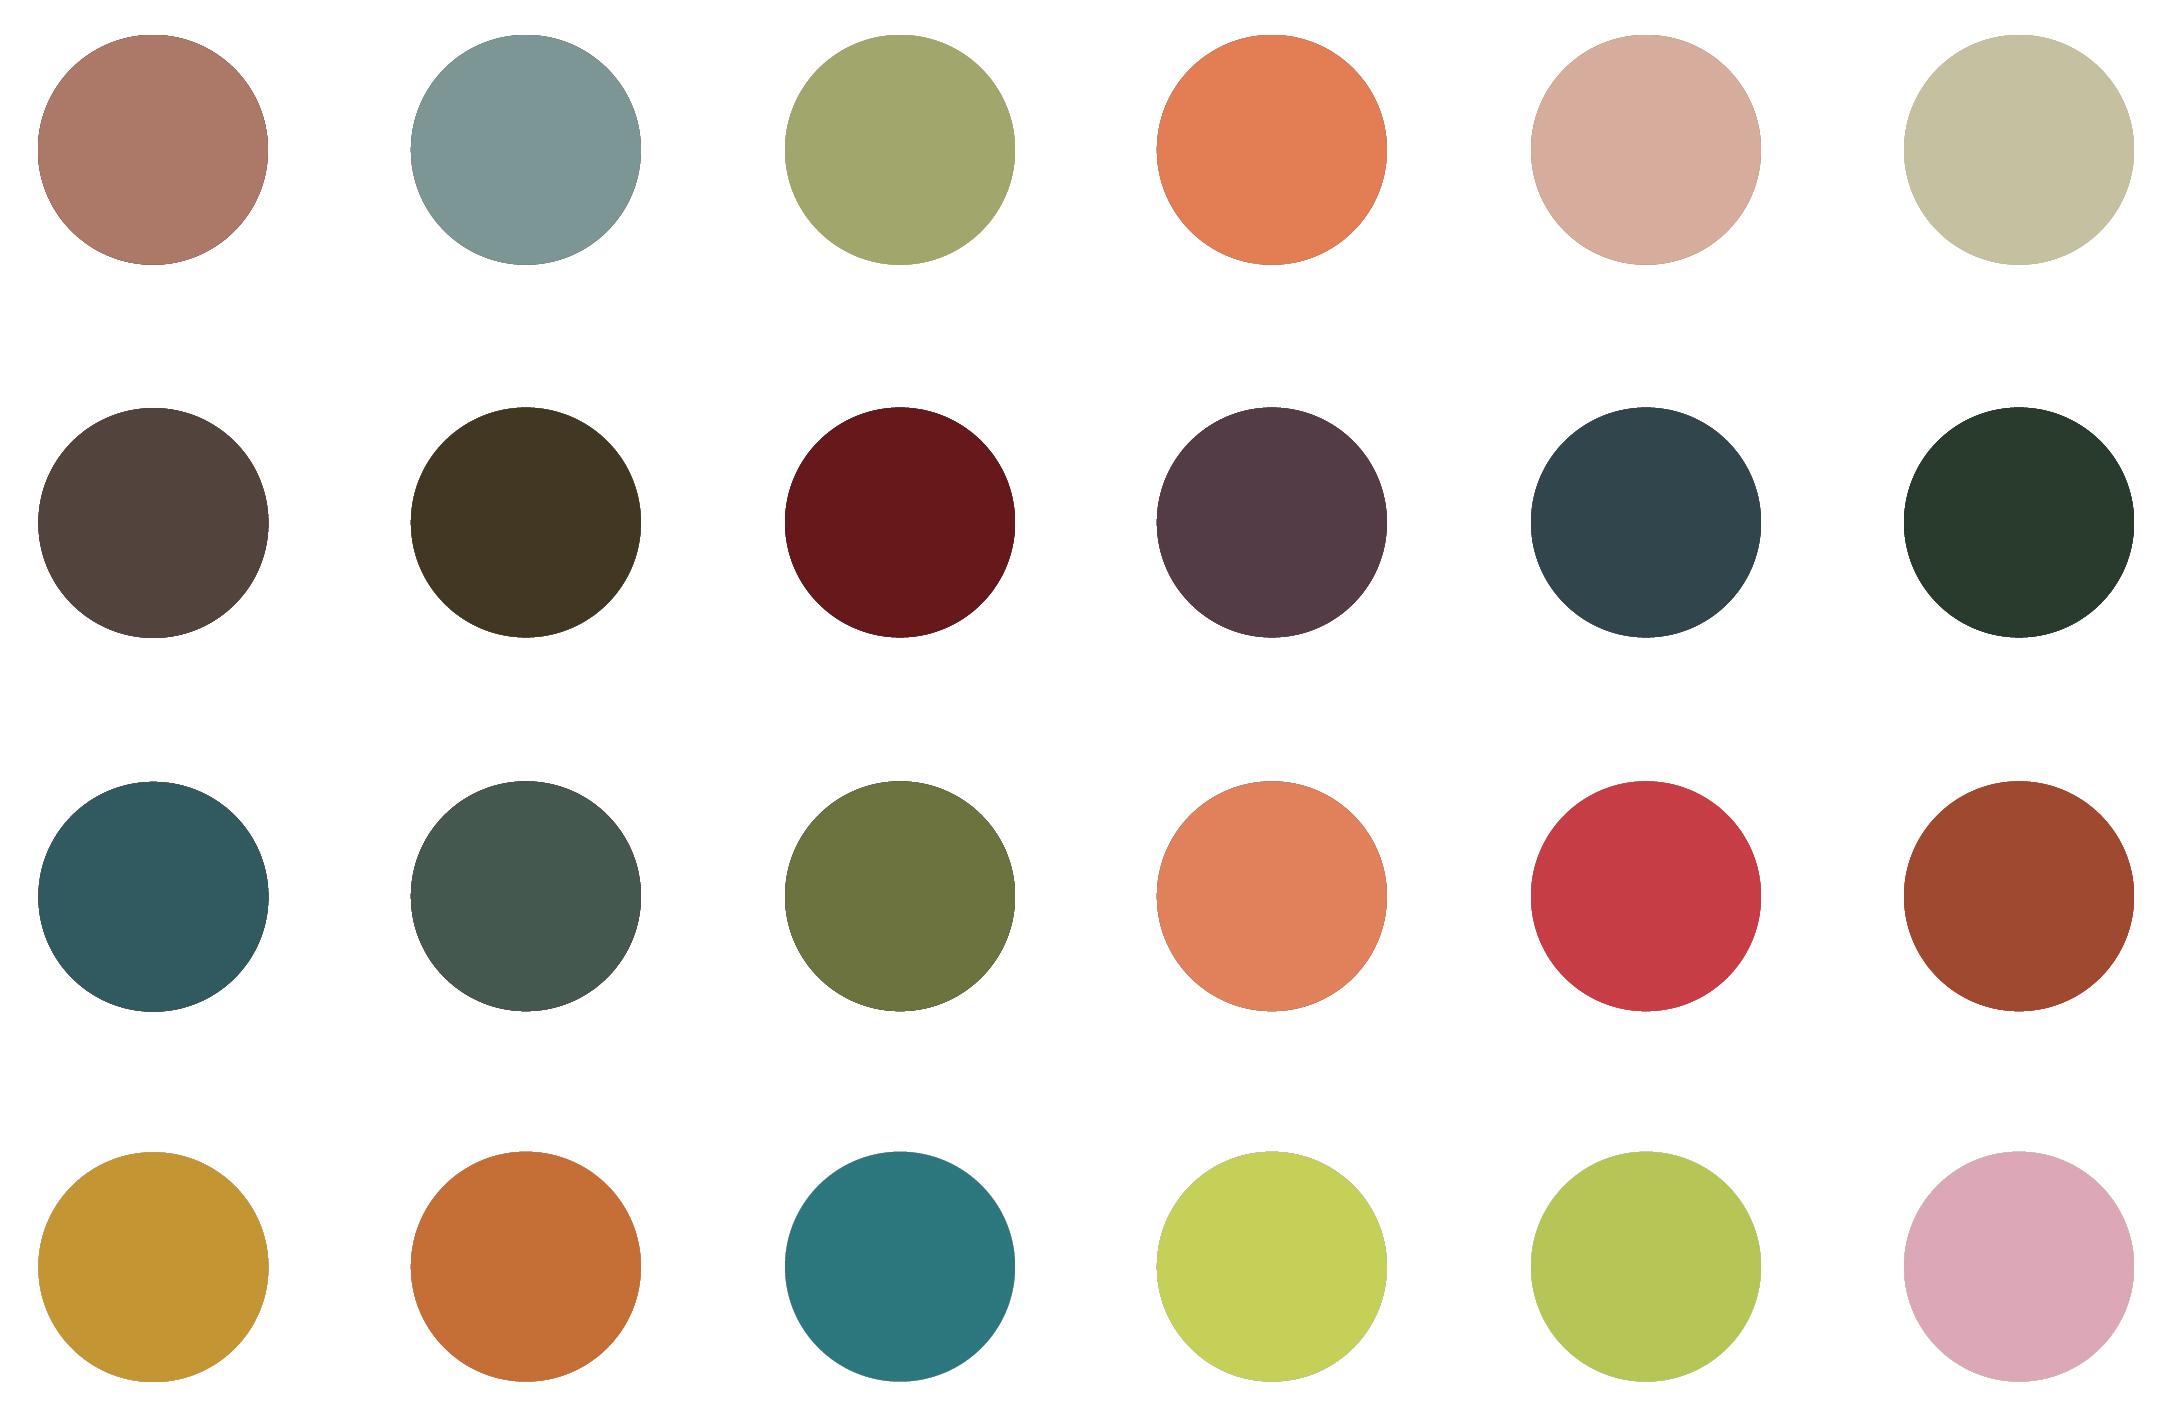 EgoStyle-Color-Illu-4.jpg